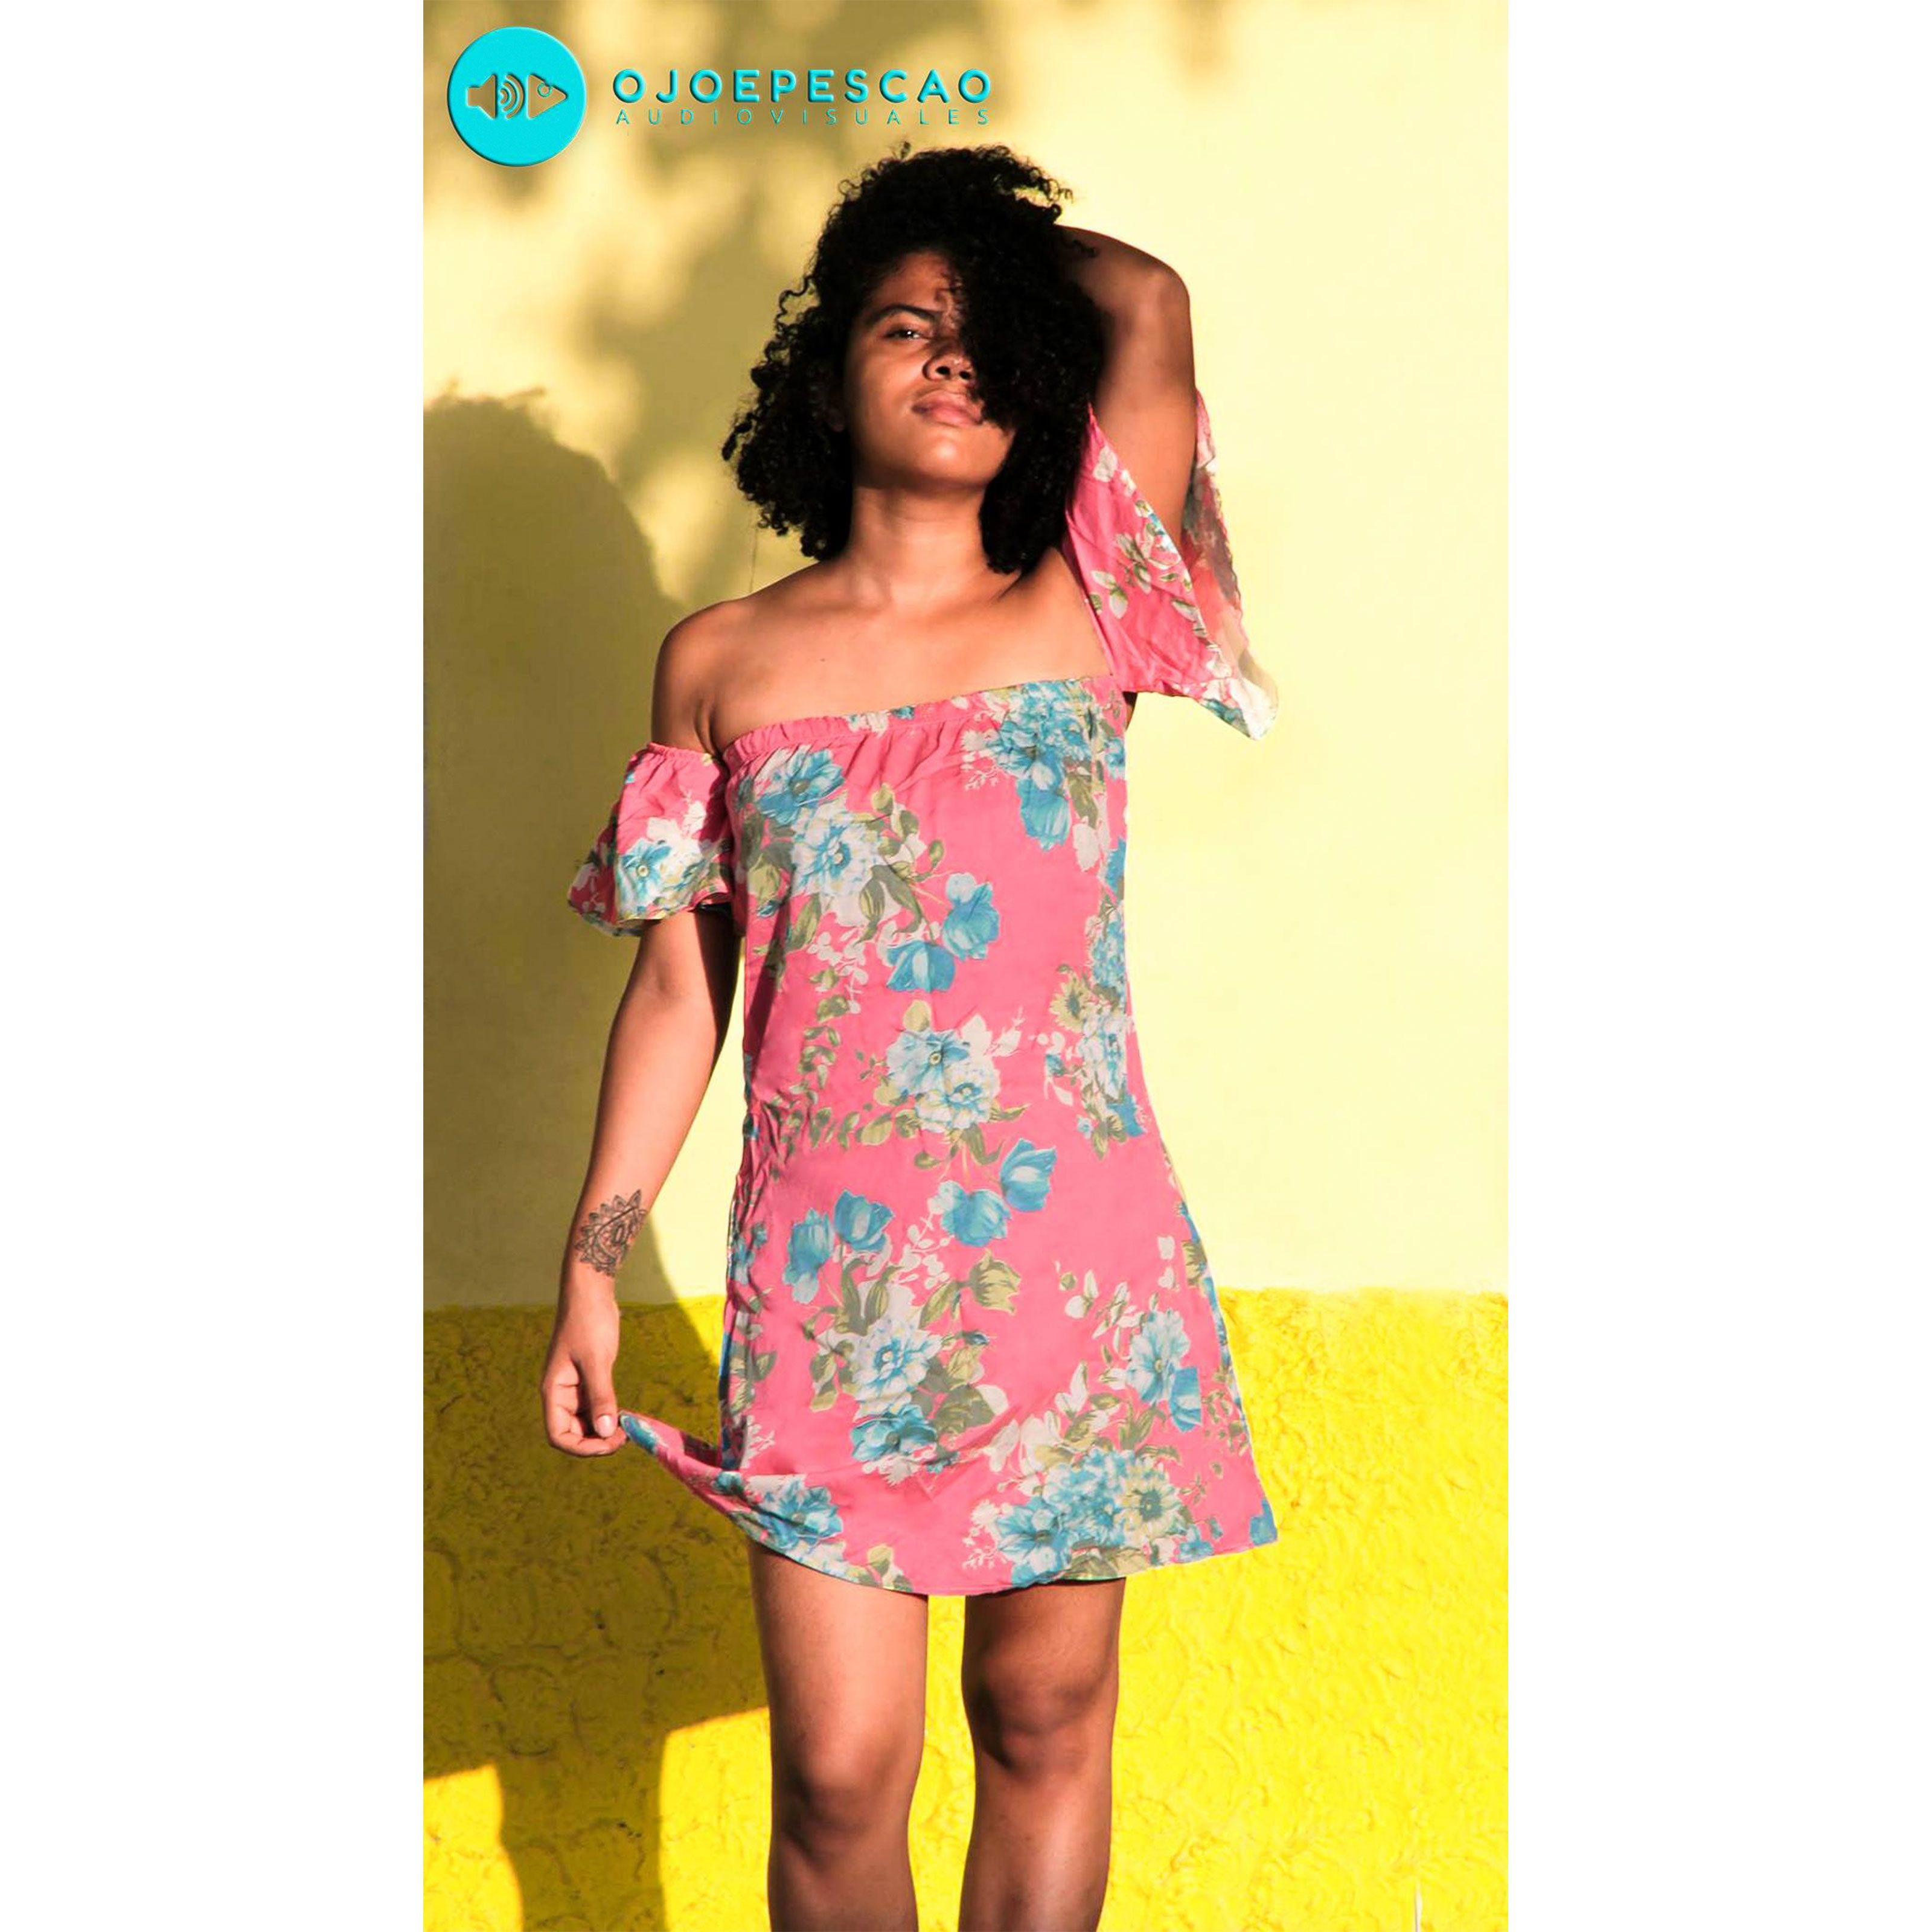 aa14a2f8e56c3 Vestido estampado manga campesina - Talla M Prenda única disponible para  entrega inmediata  KIKAMAGA  Vestido  Mujer  Dama  Flores  Flowers  Girls   Tropical ...